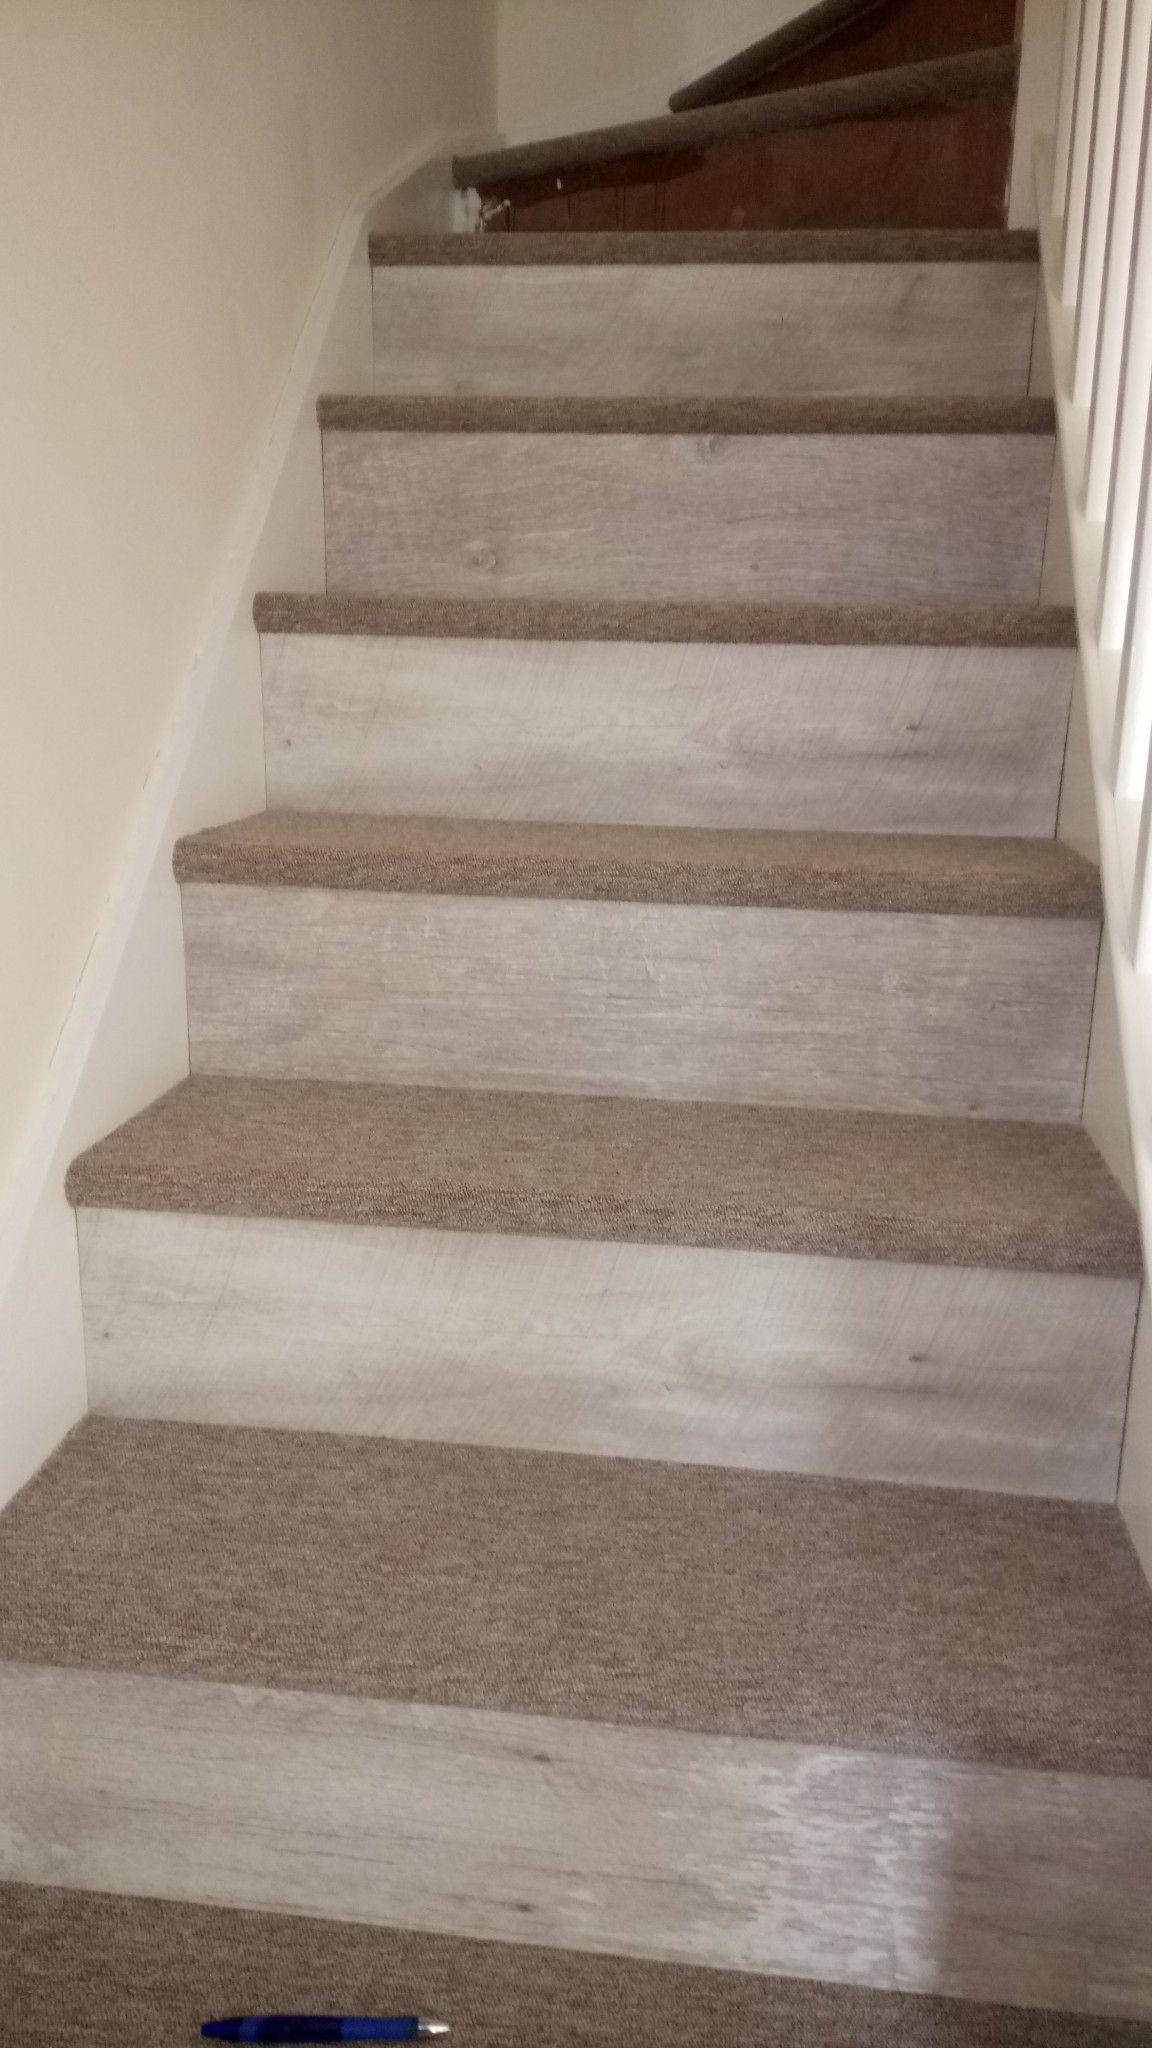 Carpet Laminate Flooring Stairs Laminate Flooring On Stairs Stairs Laminate Flooring